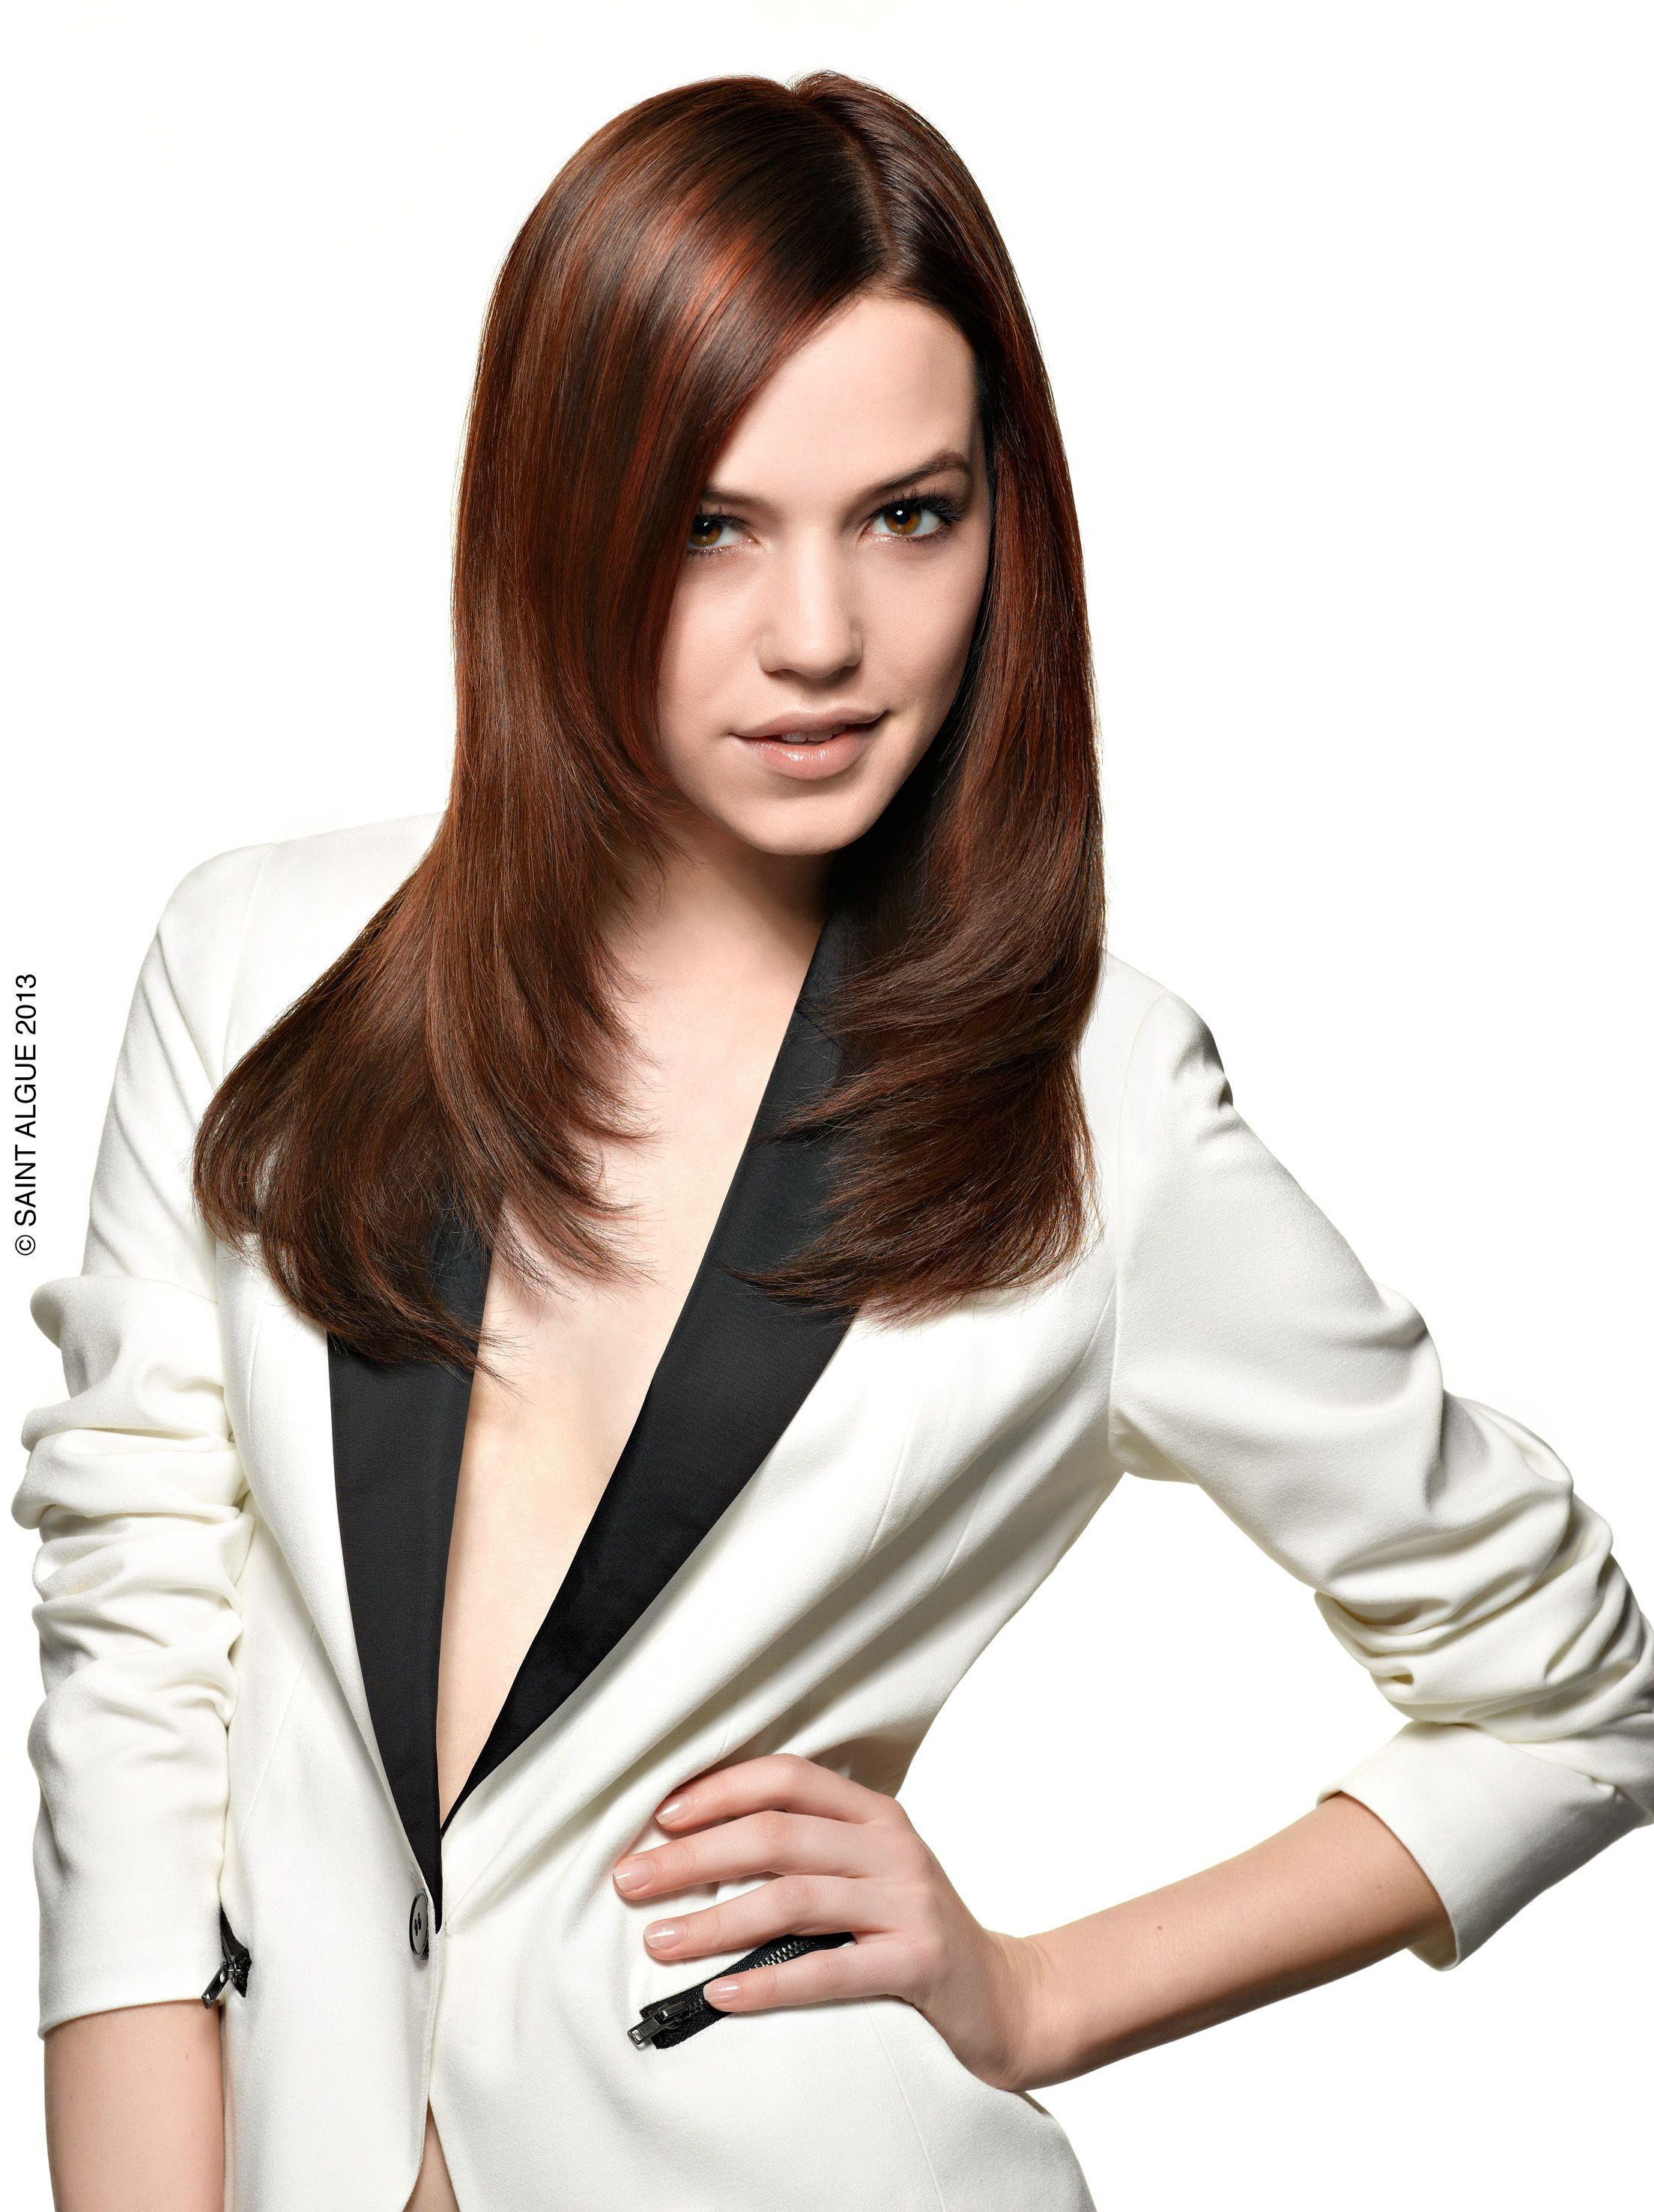 20 coiffures de mariage pour 2014 Mariage Coiffure